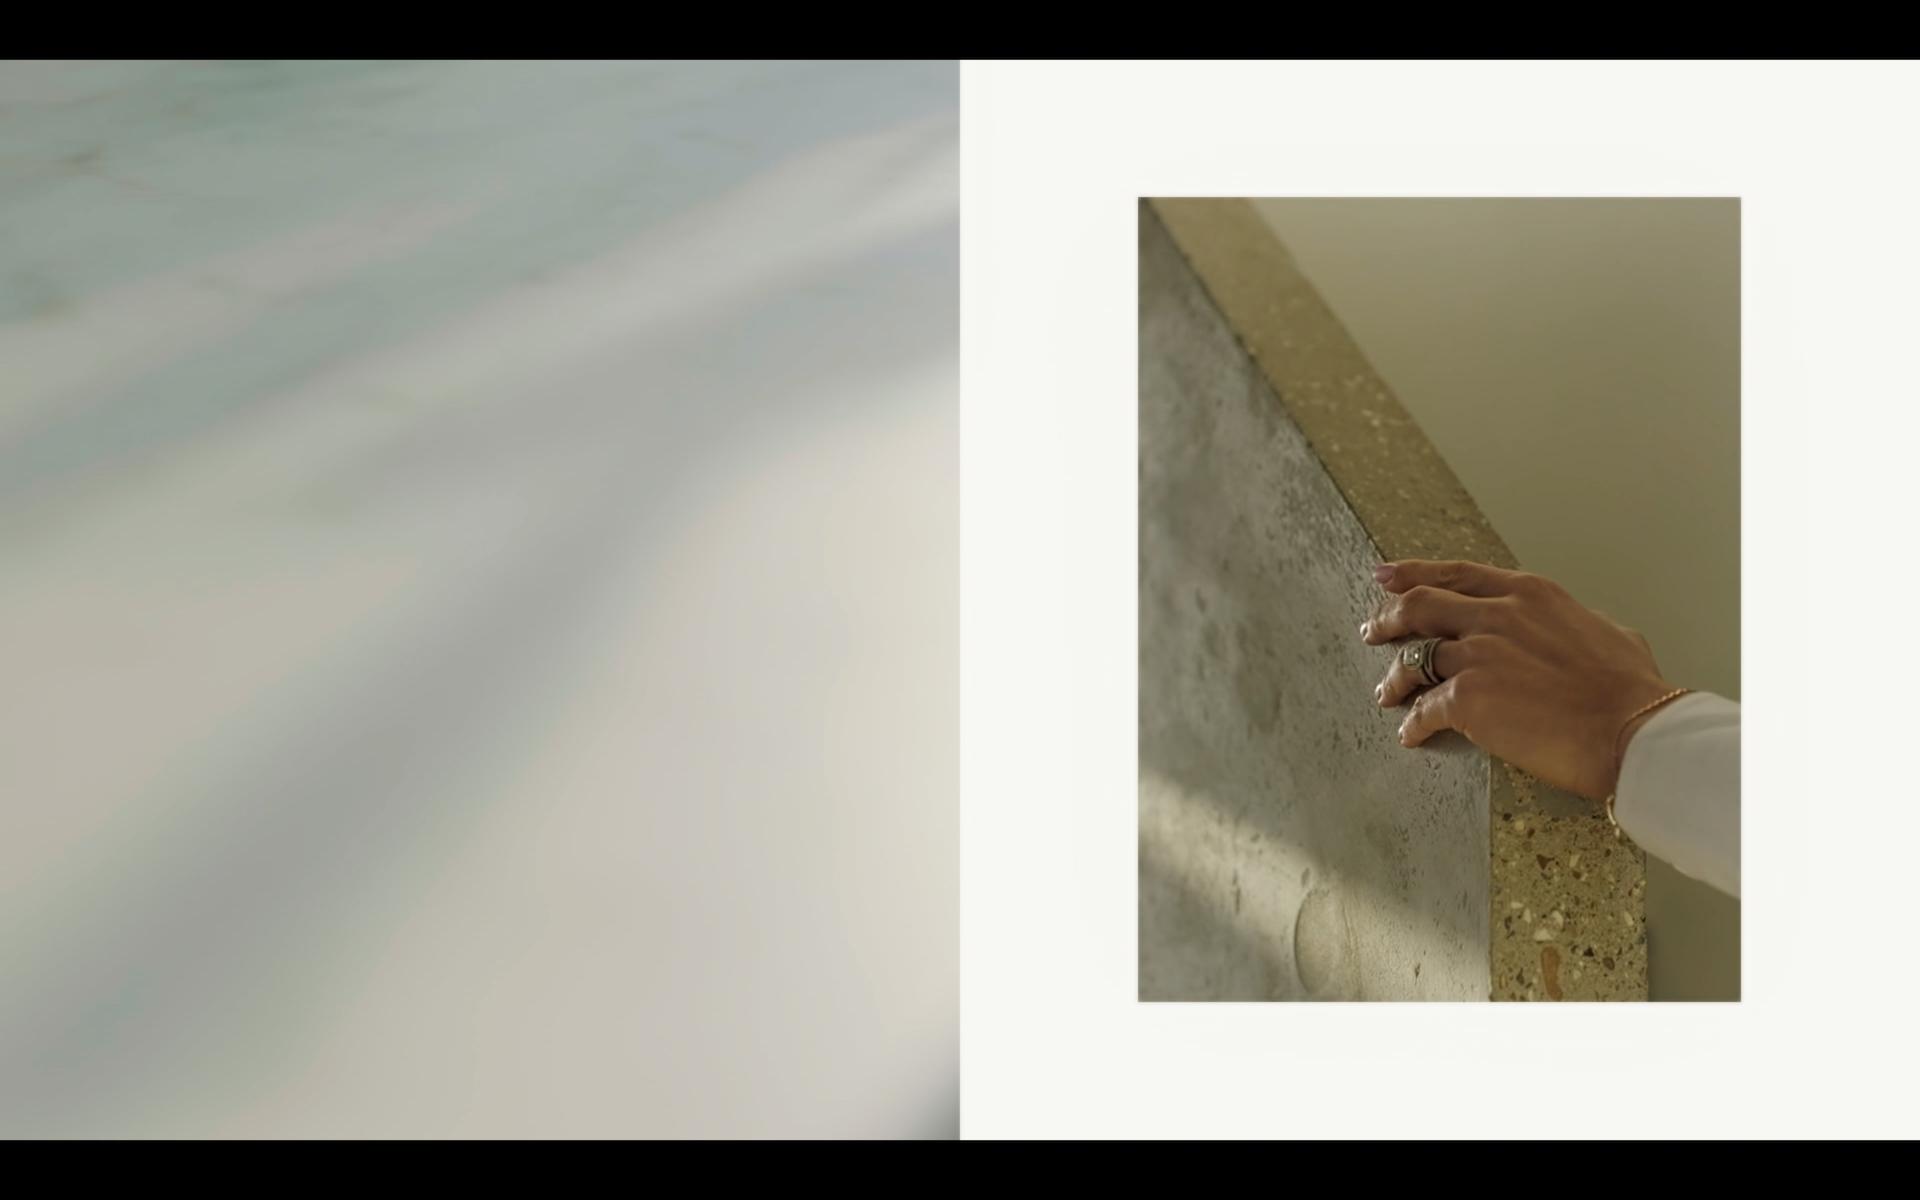 KYLE MACFADZEAN - Screenshot 2021-04-26 at 00.32.17